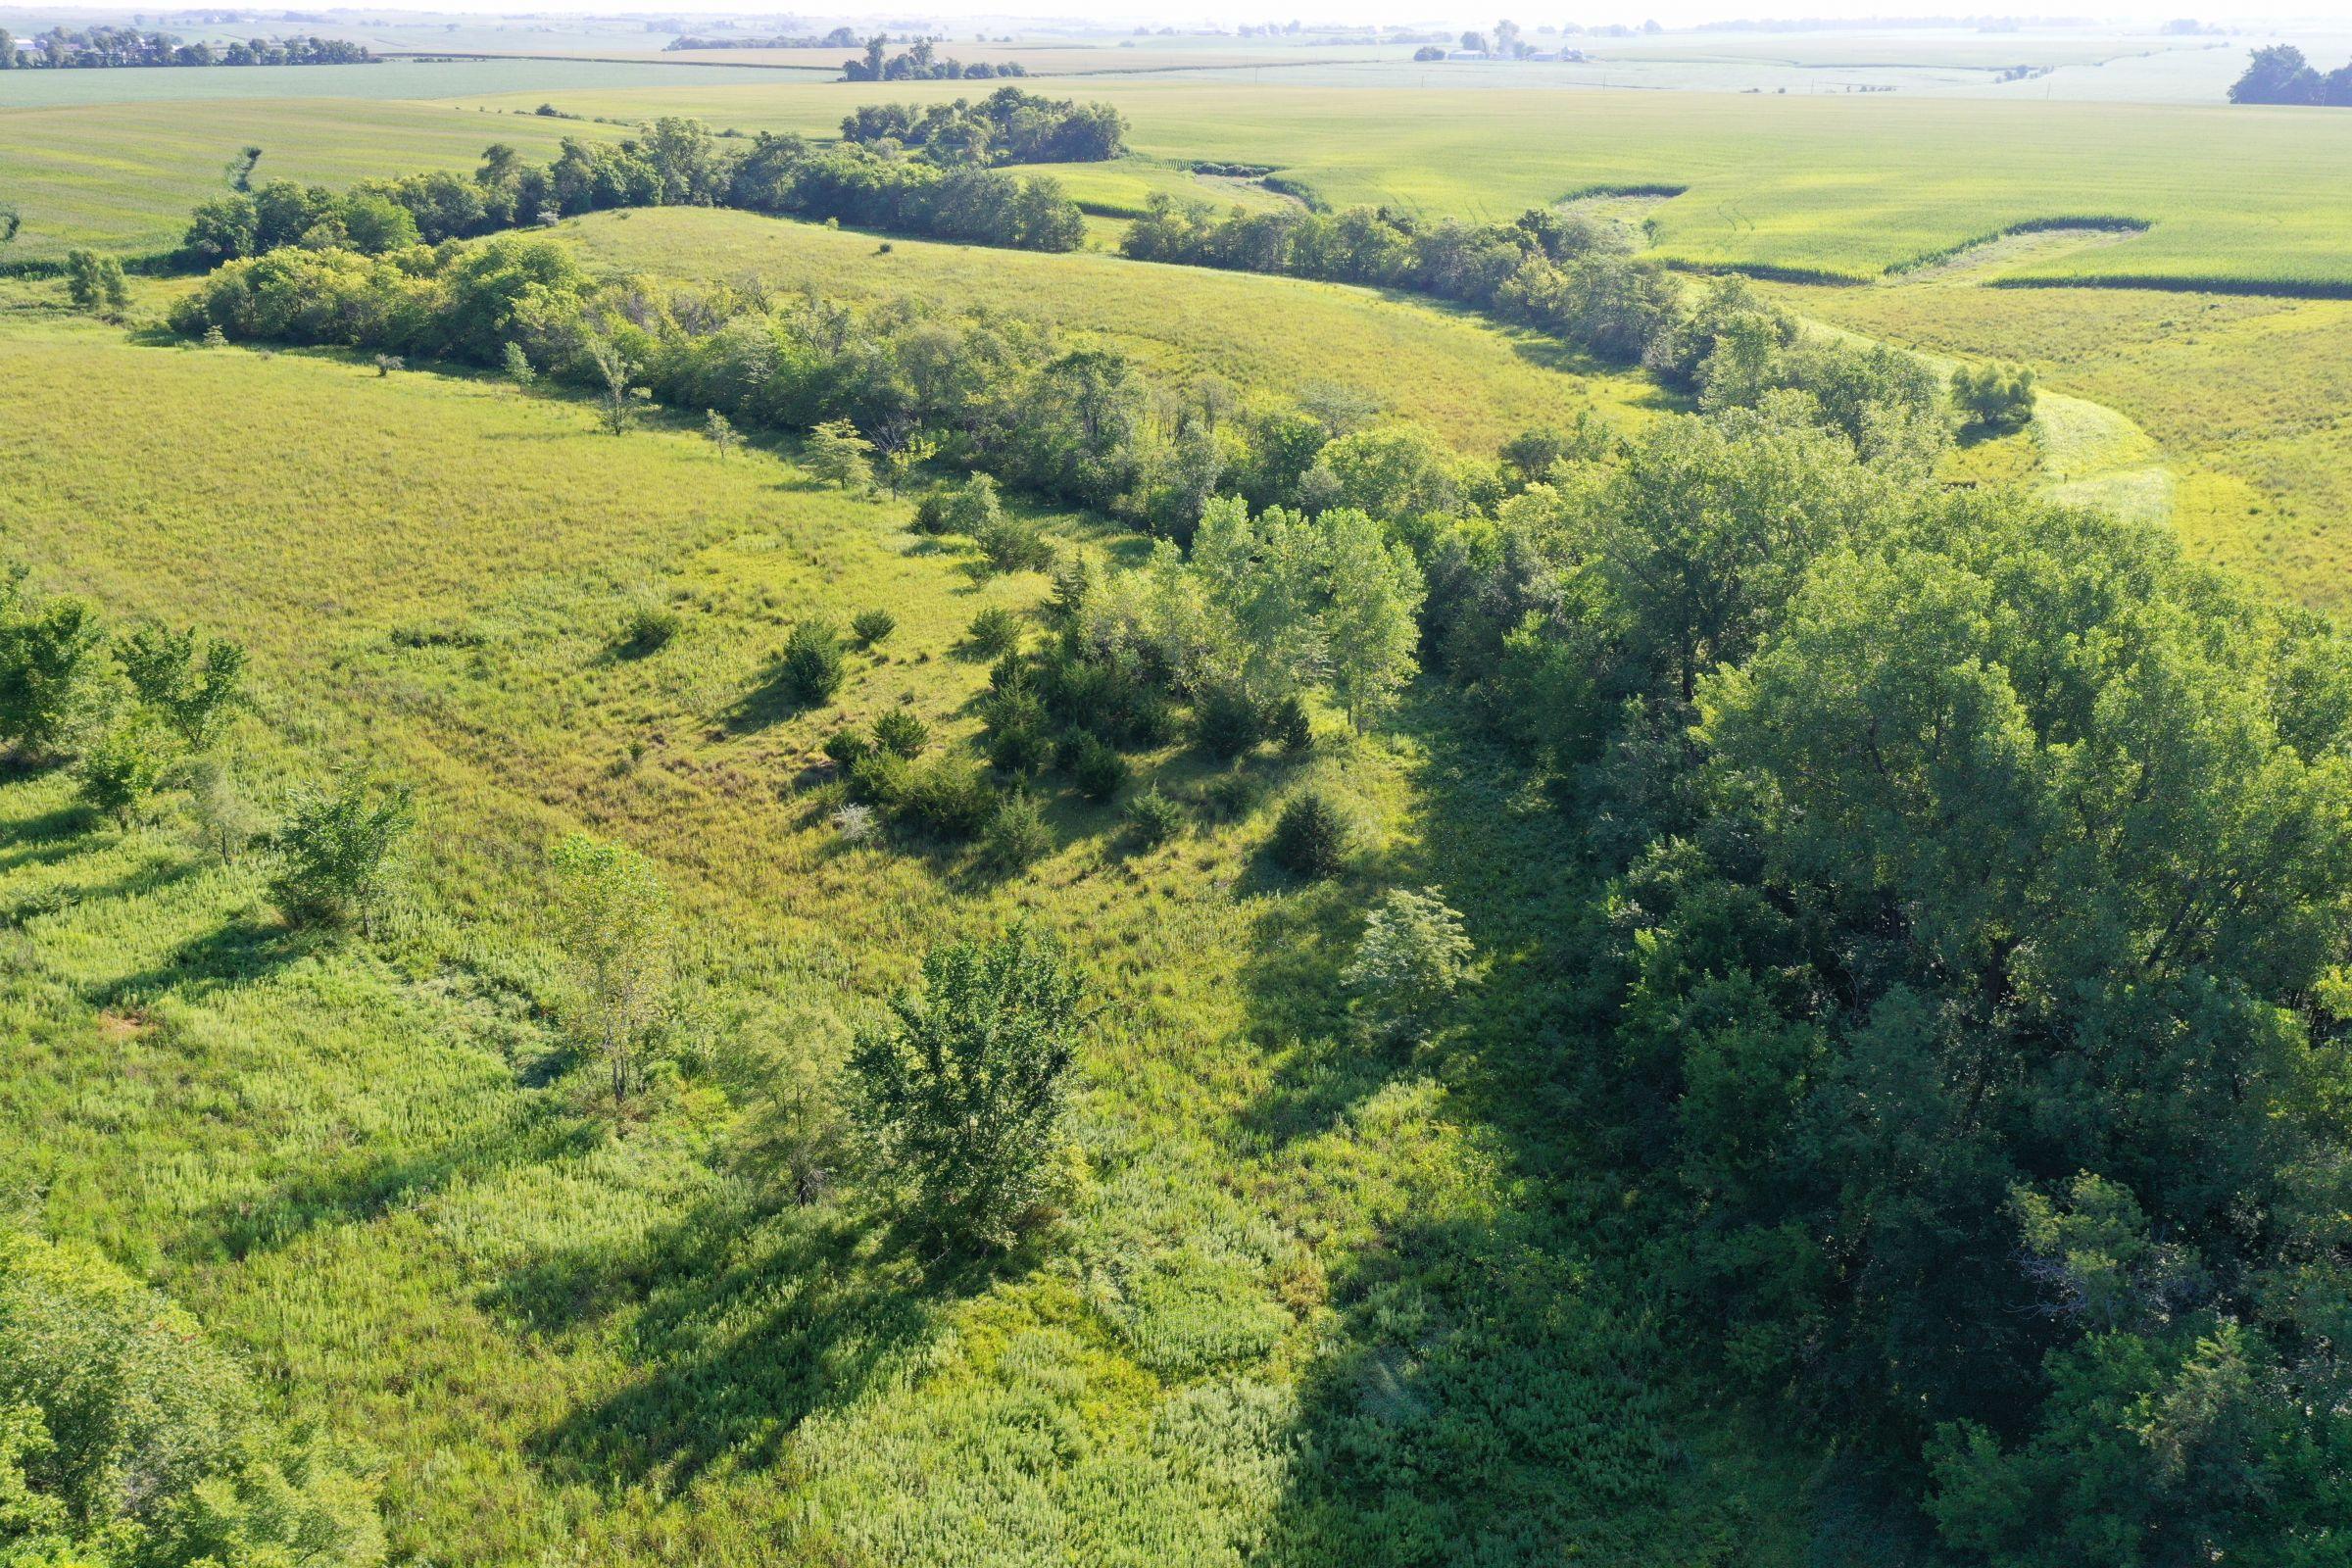 Keokuk County, Iowa Land Auction Land for sale